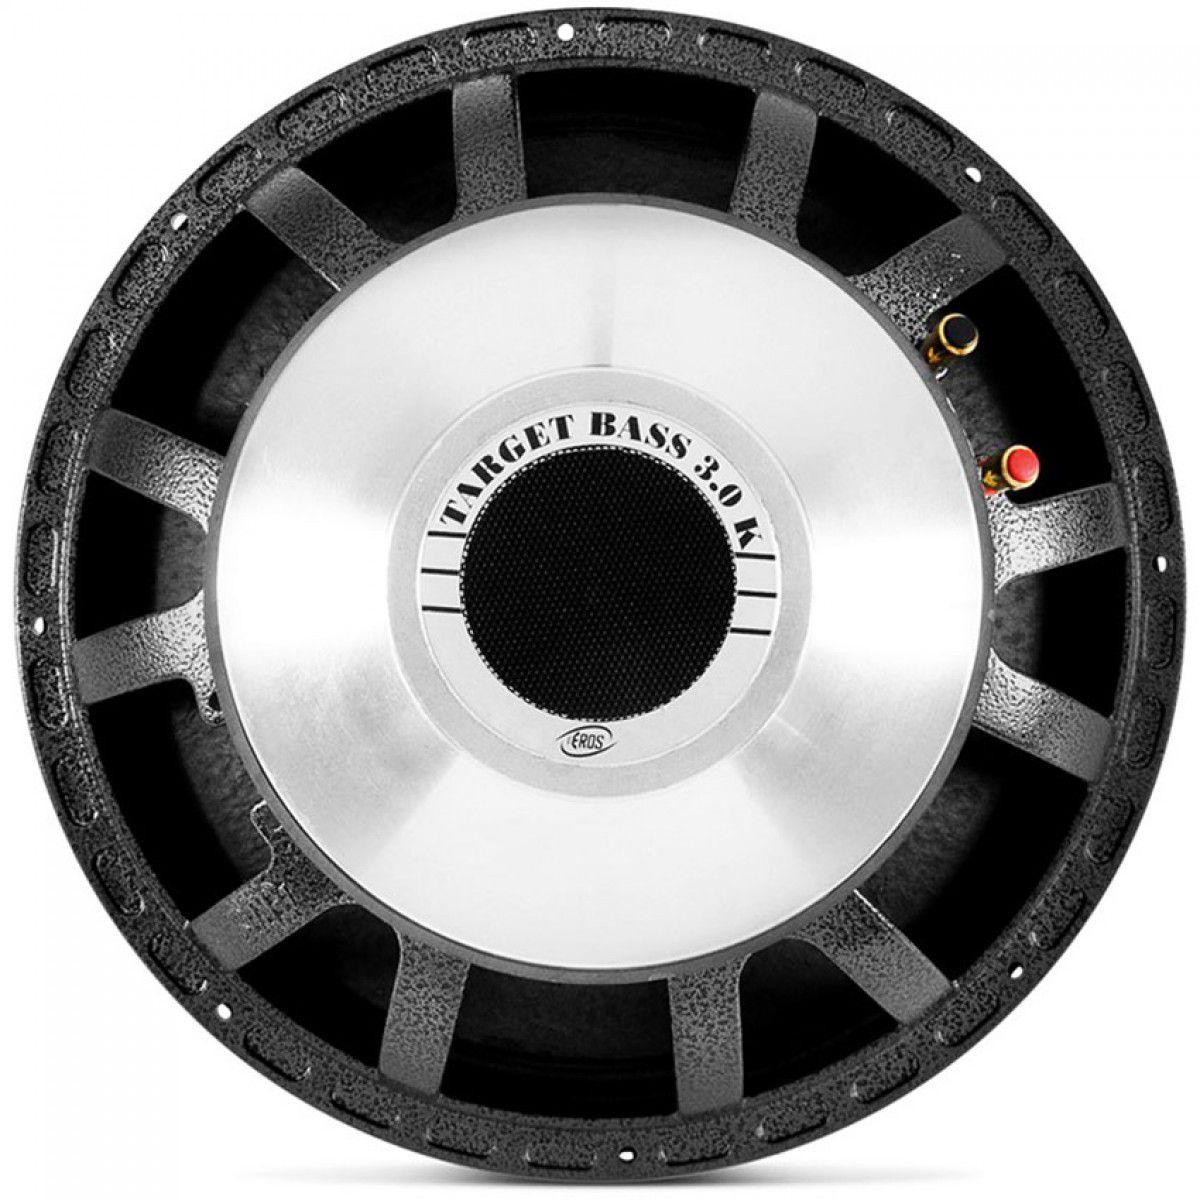 "Woofer 15"" Eros E-15 Target Bass 3.0 K Cromado - 1500 Watts RMS OFERTA"